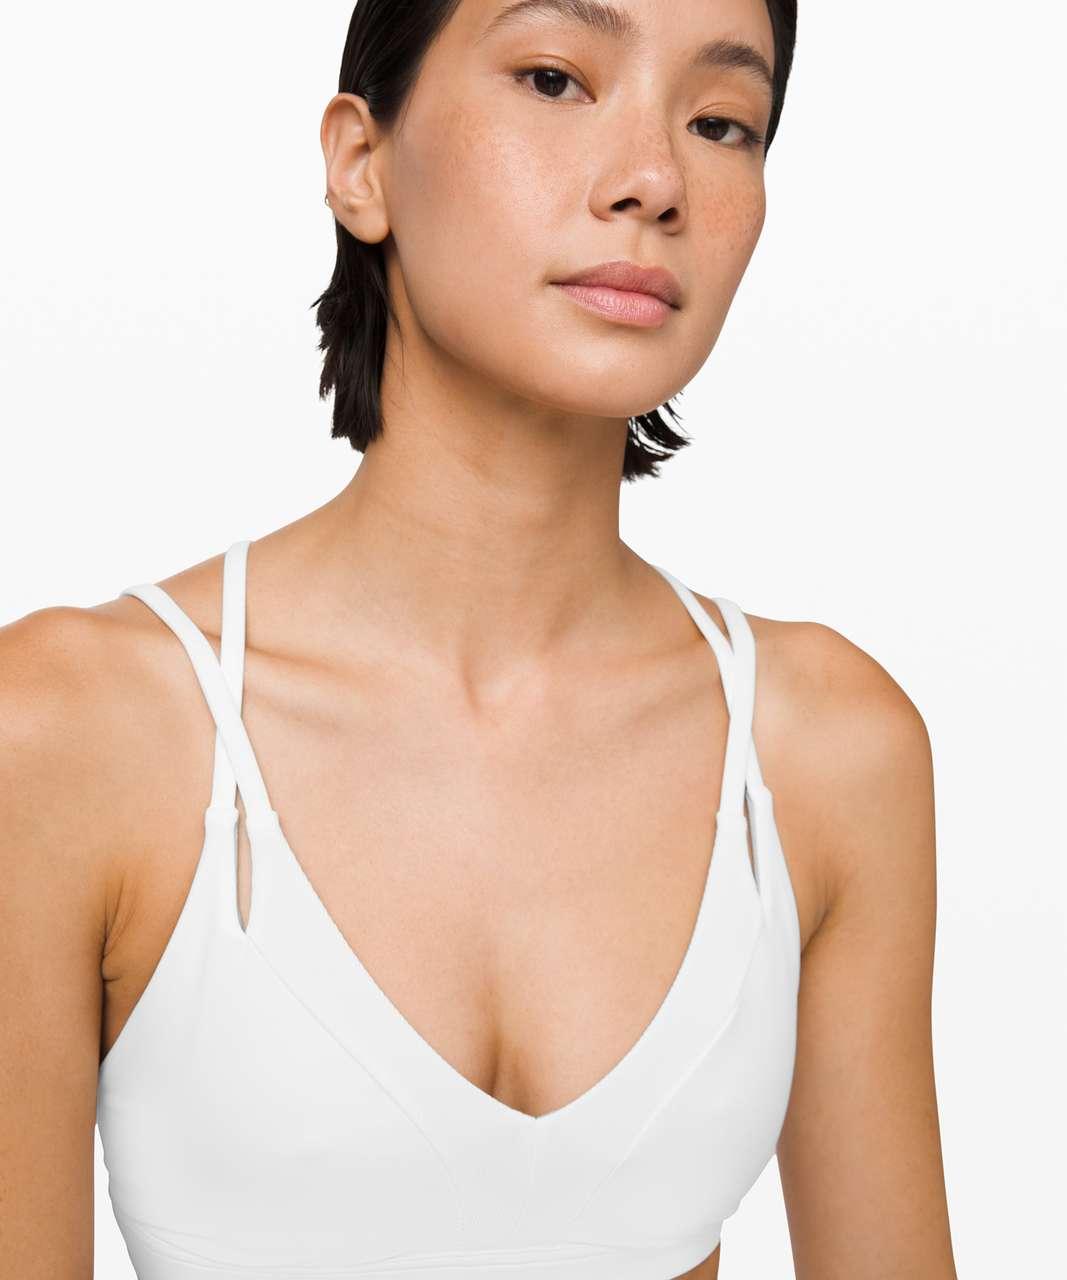 Lululemon New Ambition Bra - White / White